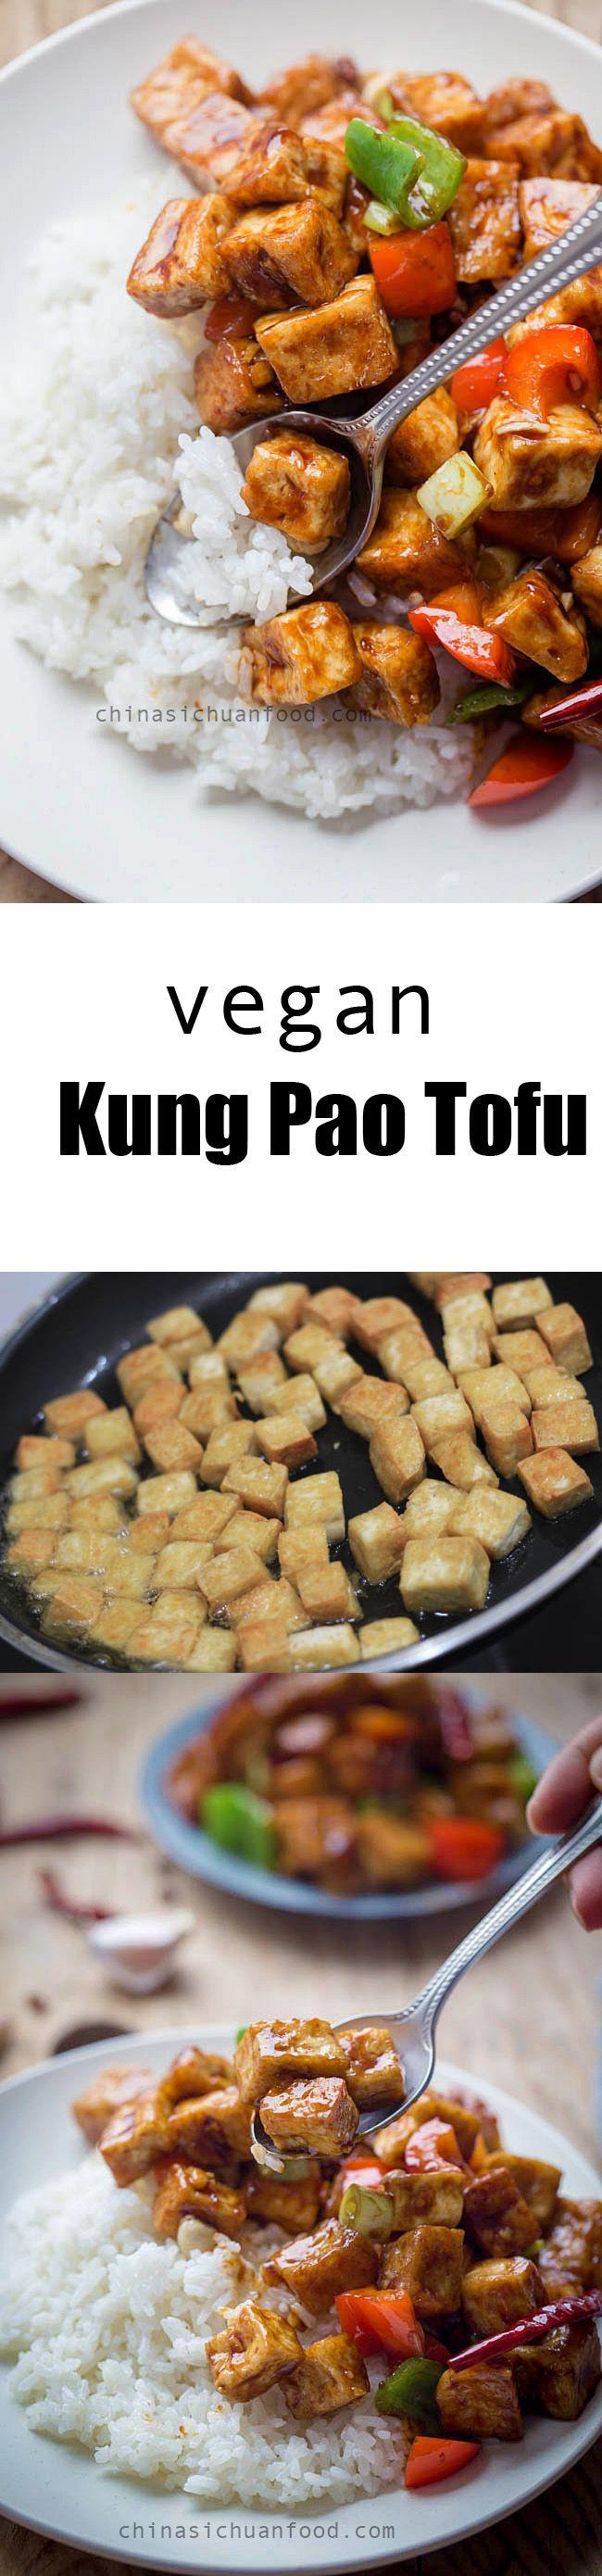 Vegan Kung Pao Tofu | ChinaSichuanFood.com